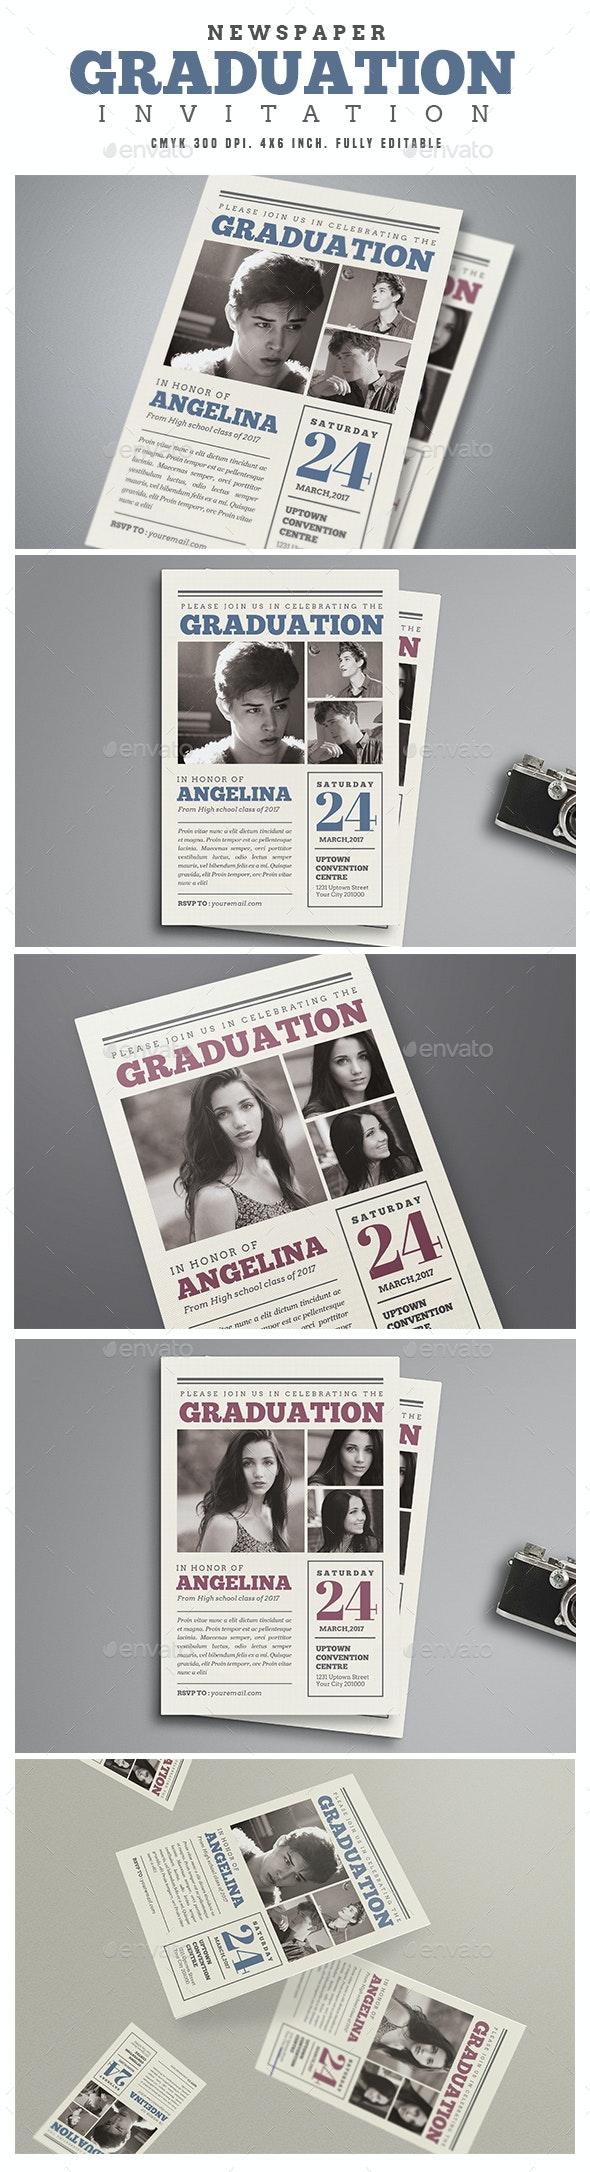 Newspaper Graduation invitation - Cards & Invites Print Templates